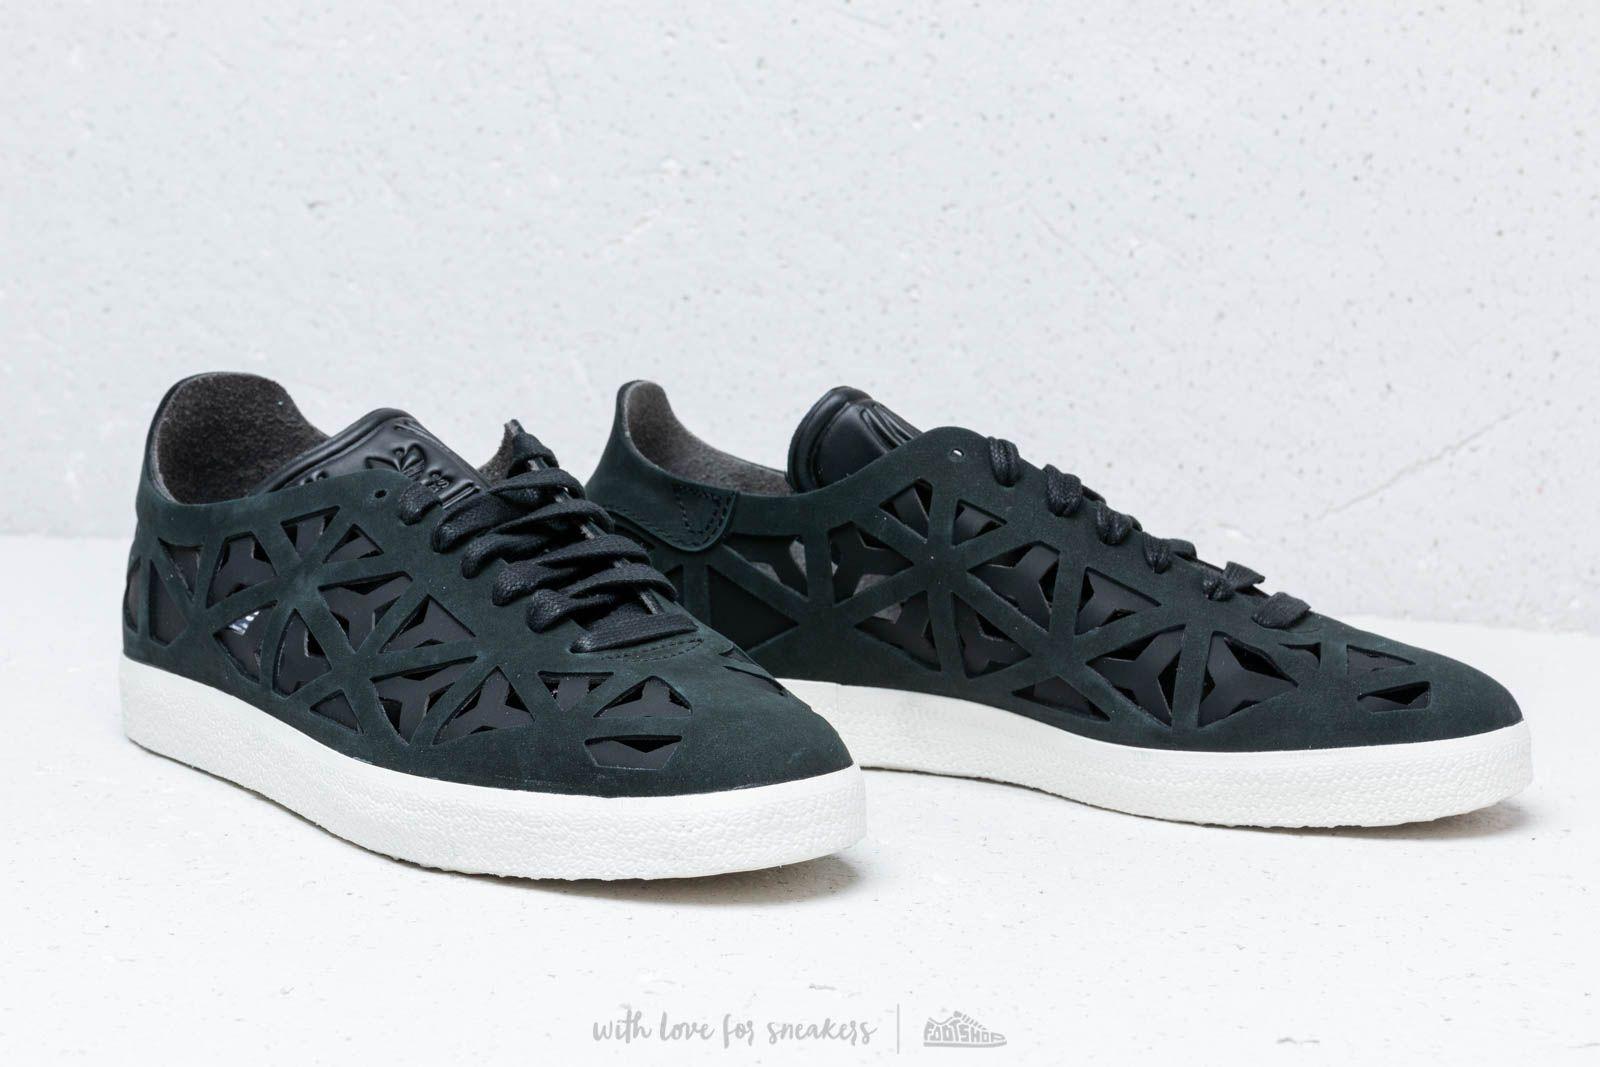 adidas Gazelle Cutout W Core Black  Core Black  Off White at a great price 15e02f892